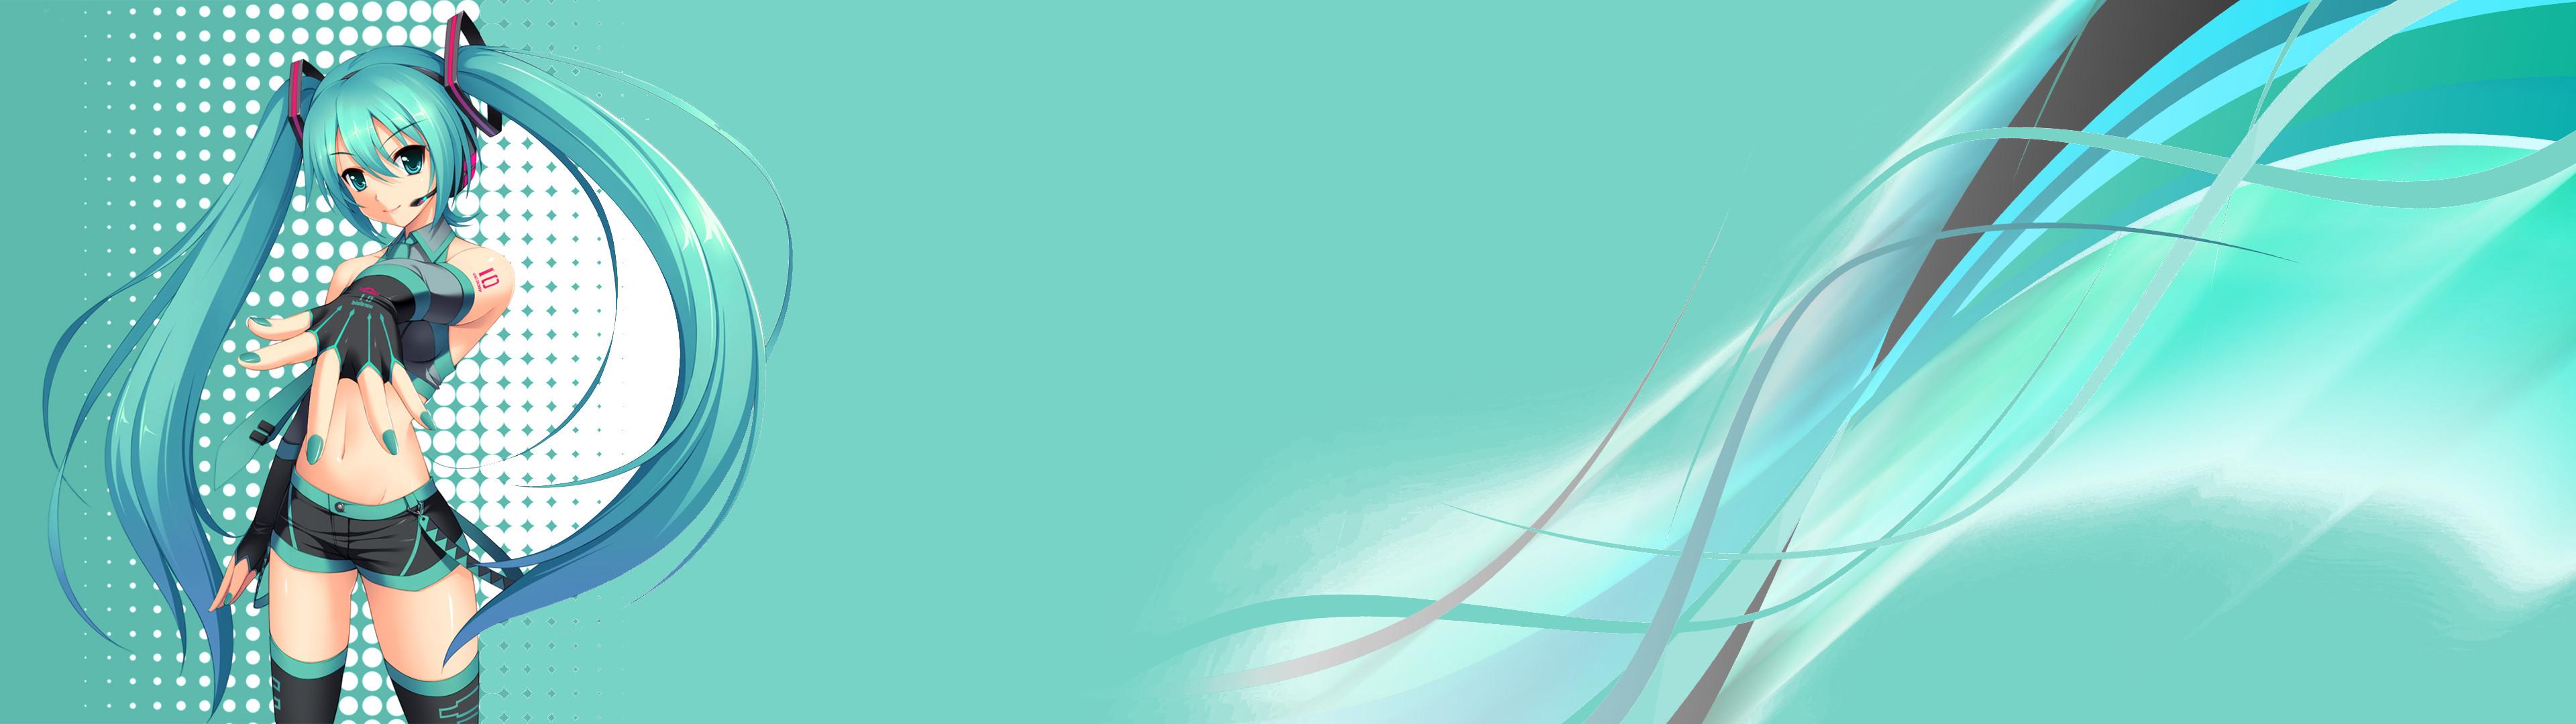 … anime vocaloid hatsune miku wallpapers hd desktop and mobile …